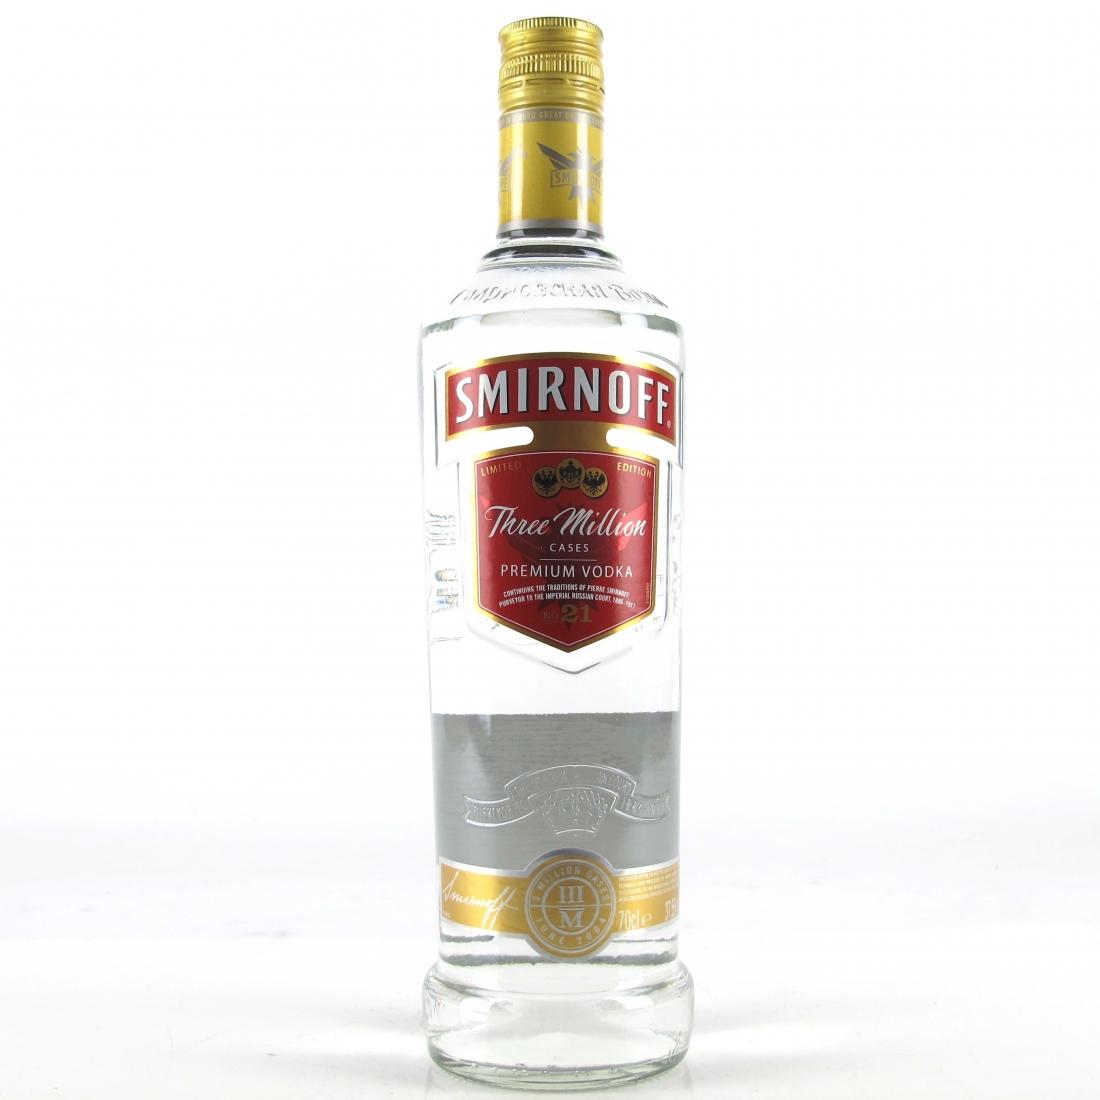 Smirnoff Vodka Three Million Cases